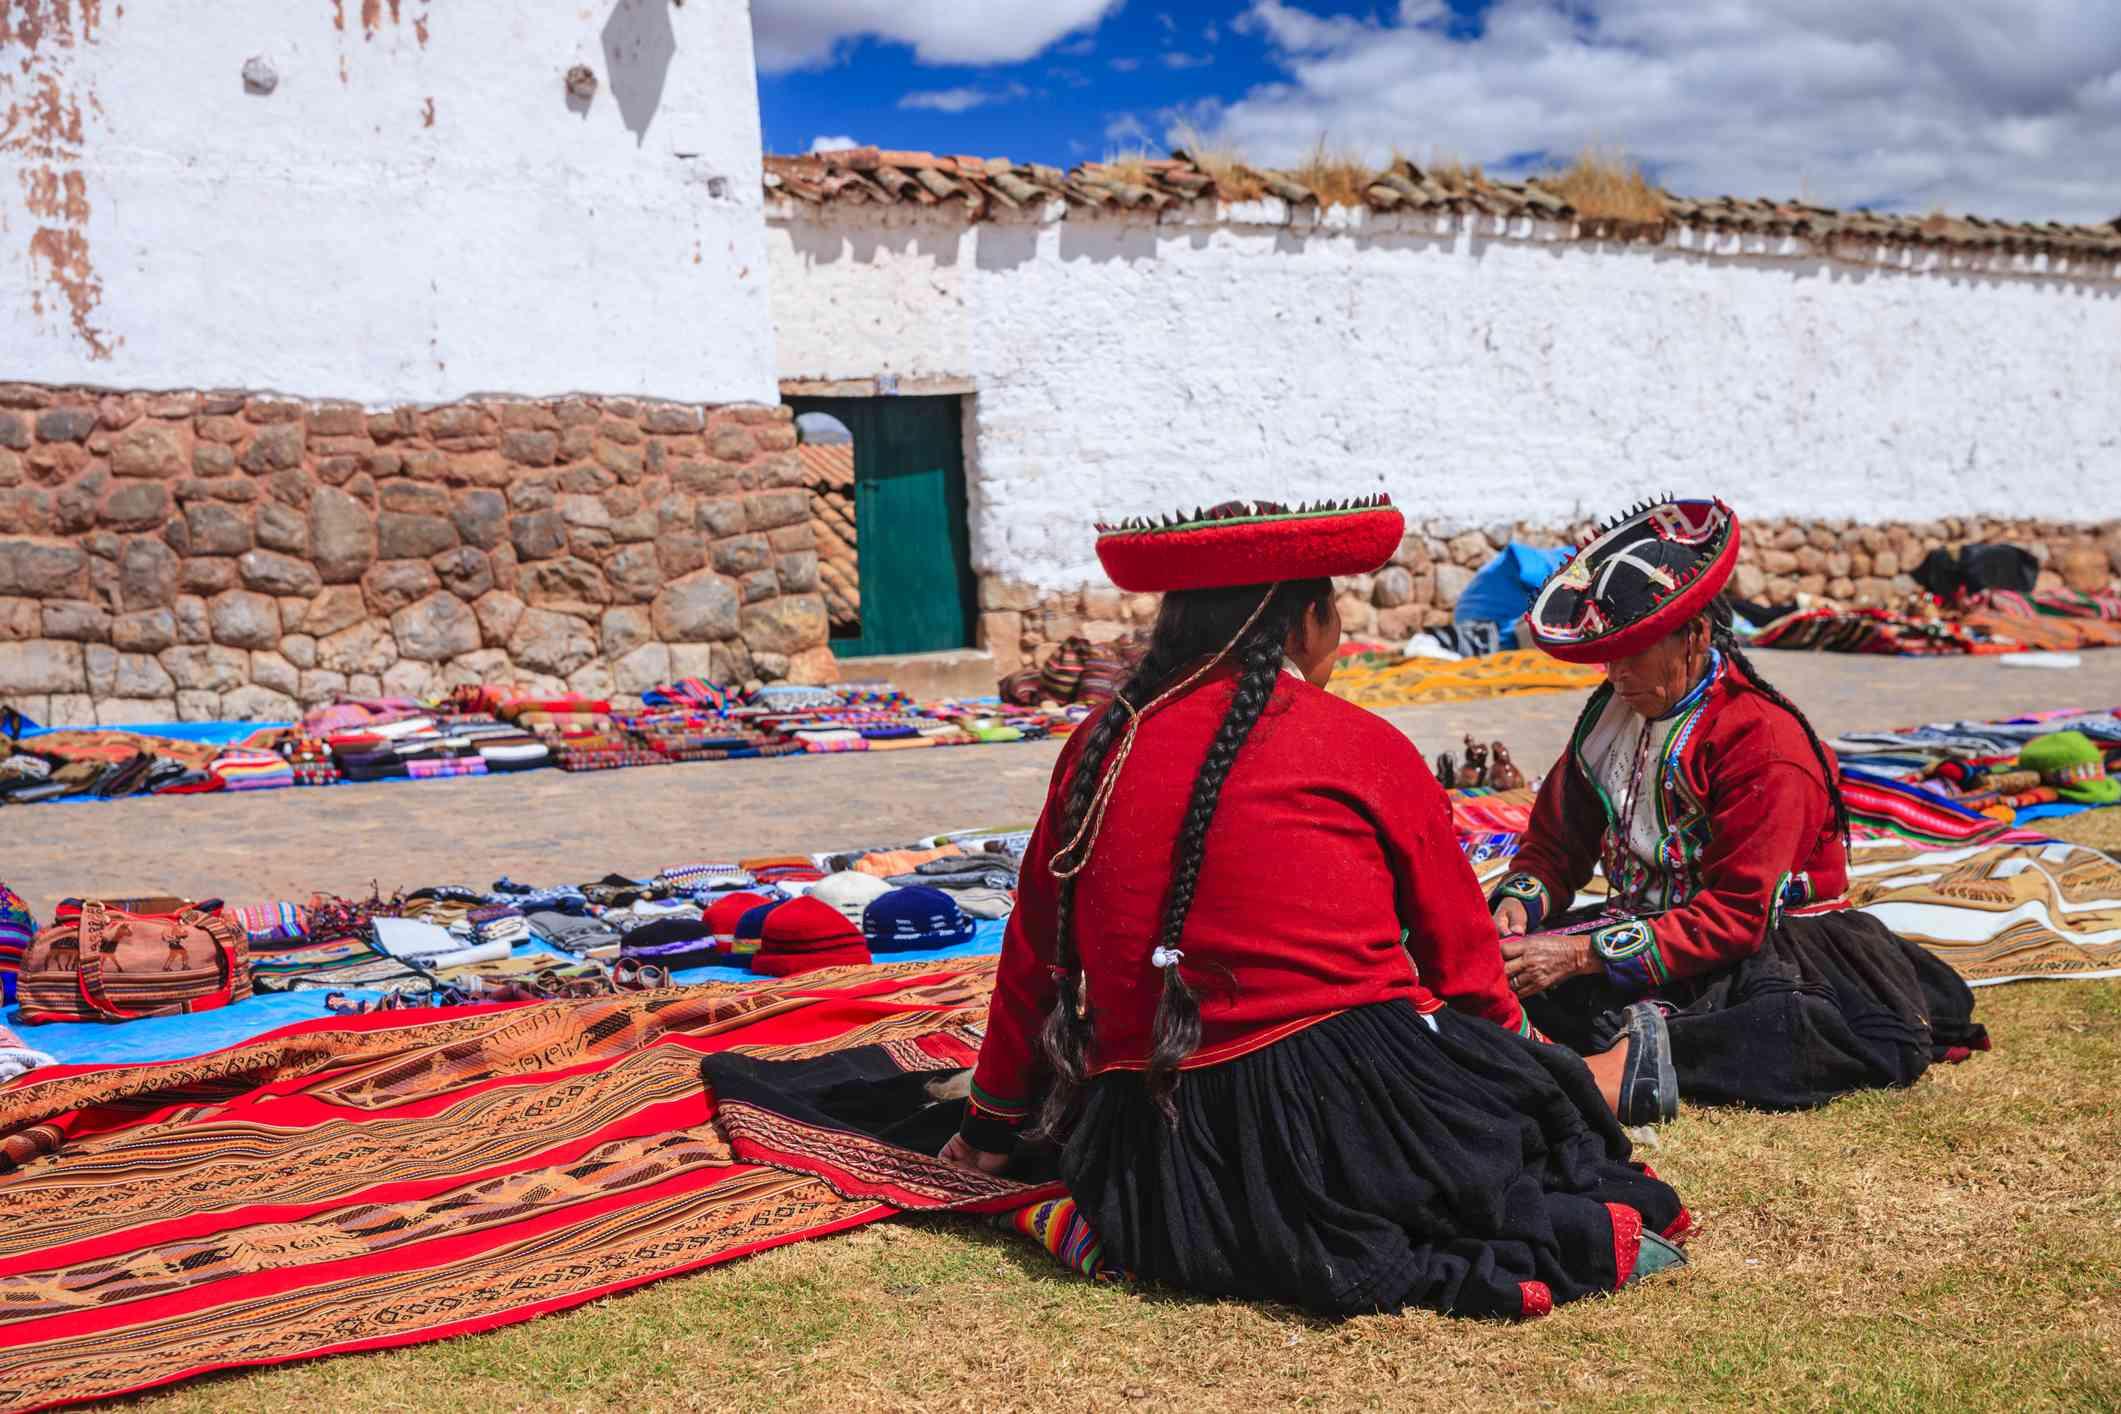 Peruvian women selling souvenirs at Inca ruins, Sacred Valley, Peru